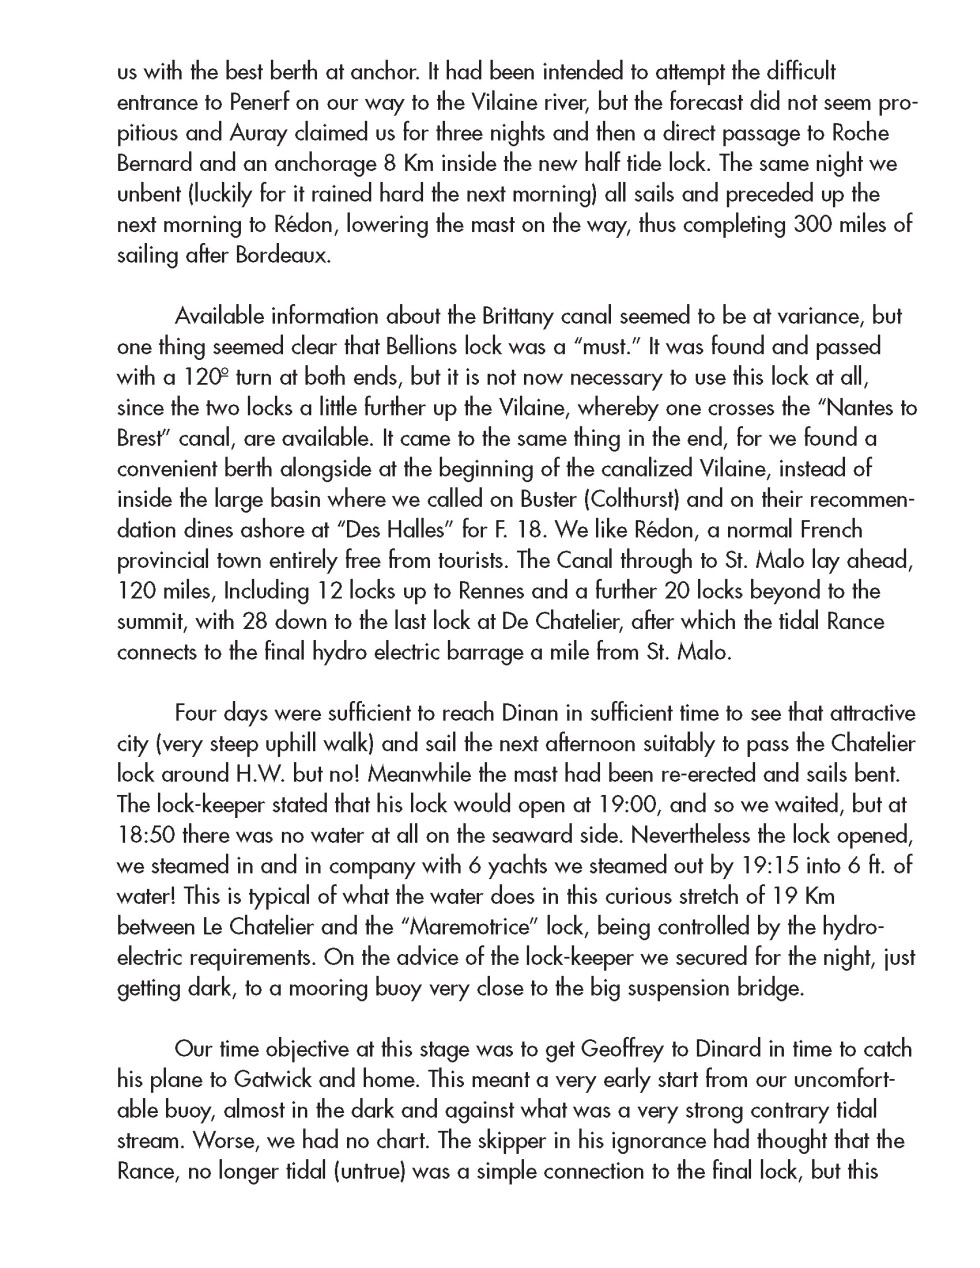 Narrative1971_Page_15